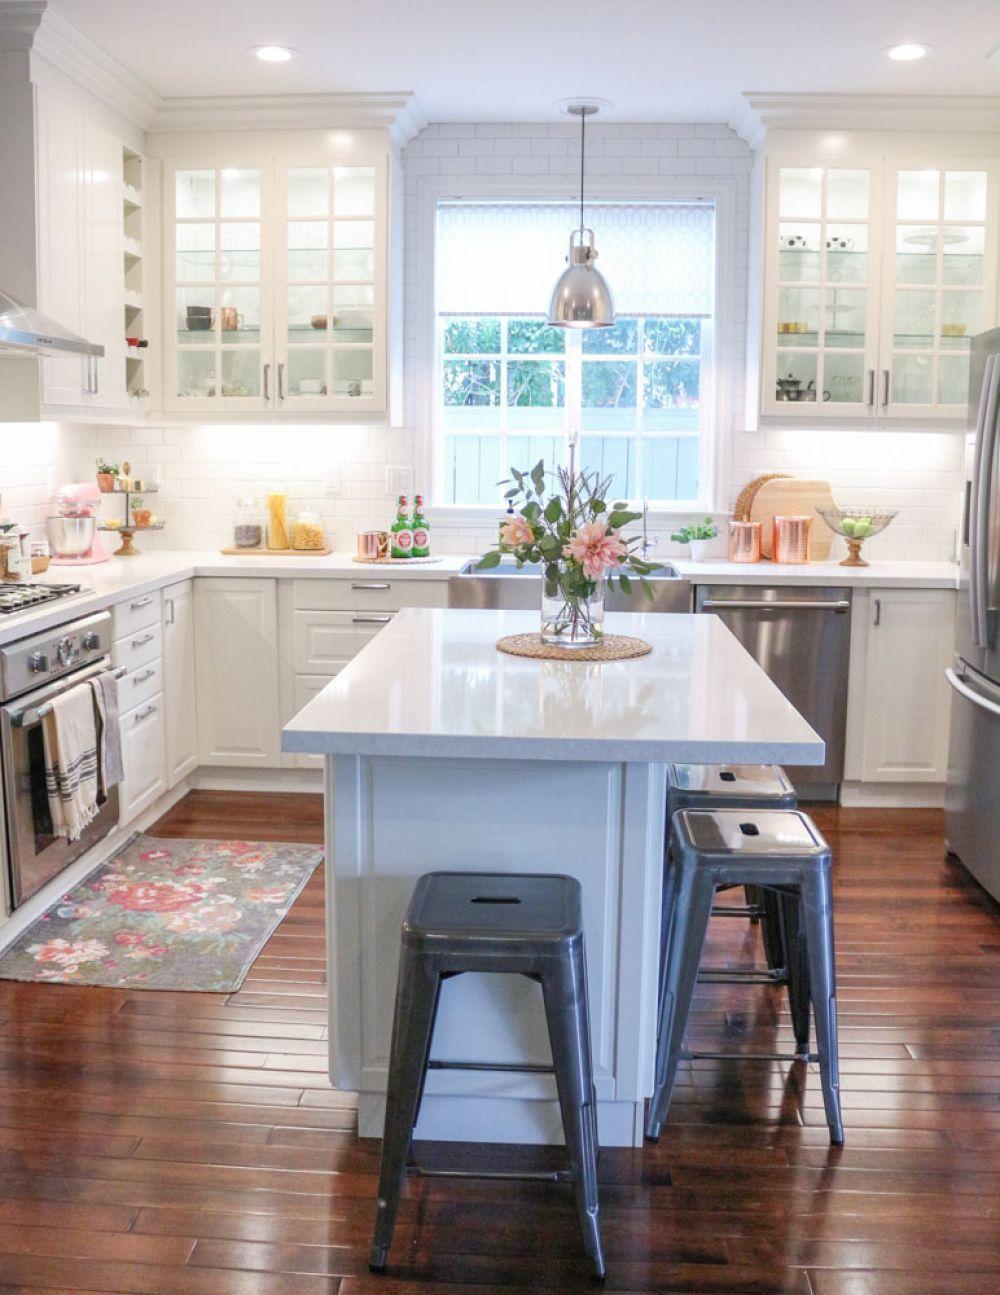 22 Tulsa Remodel Reveal Modern White Farmhouse Ideas Kitchen Remodel Small Kitchen Island With Seating Modern Kitchen